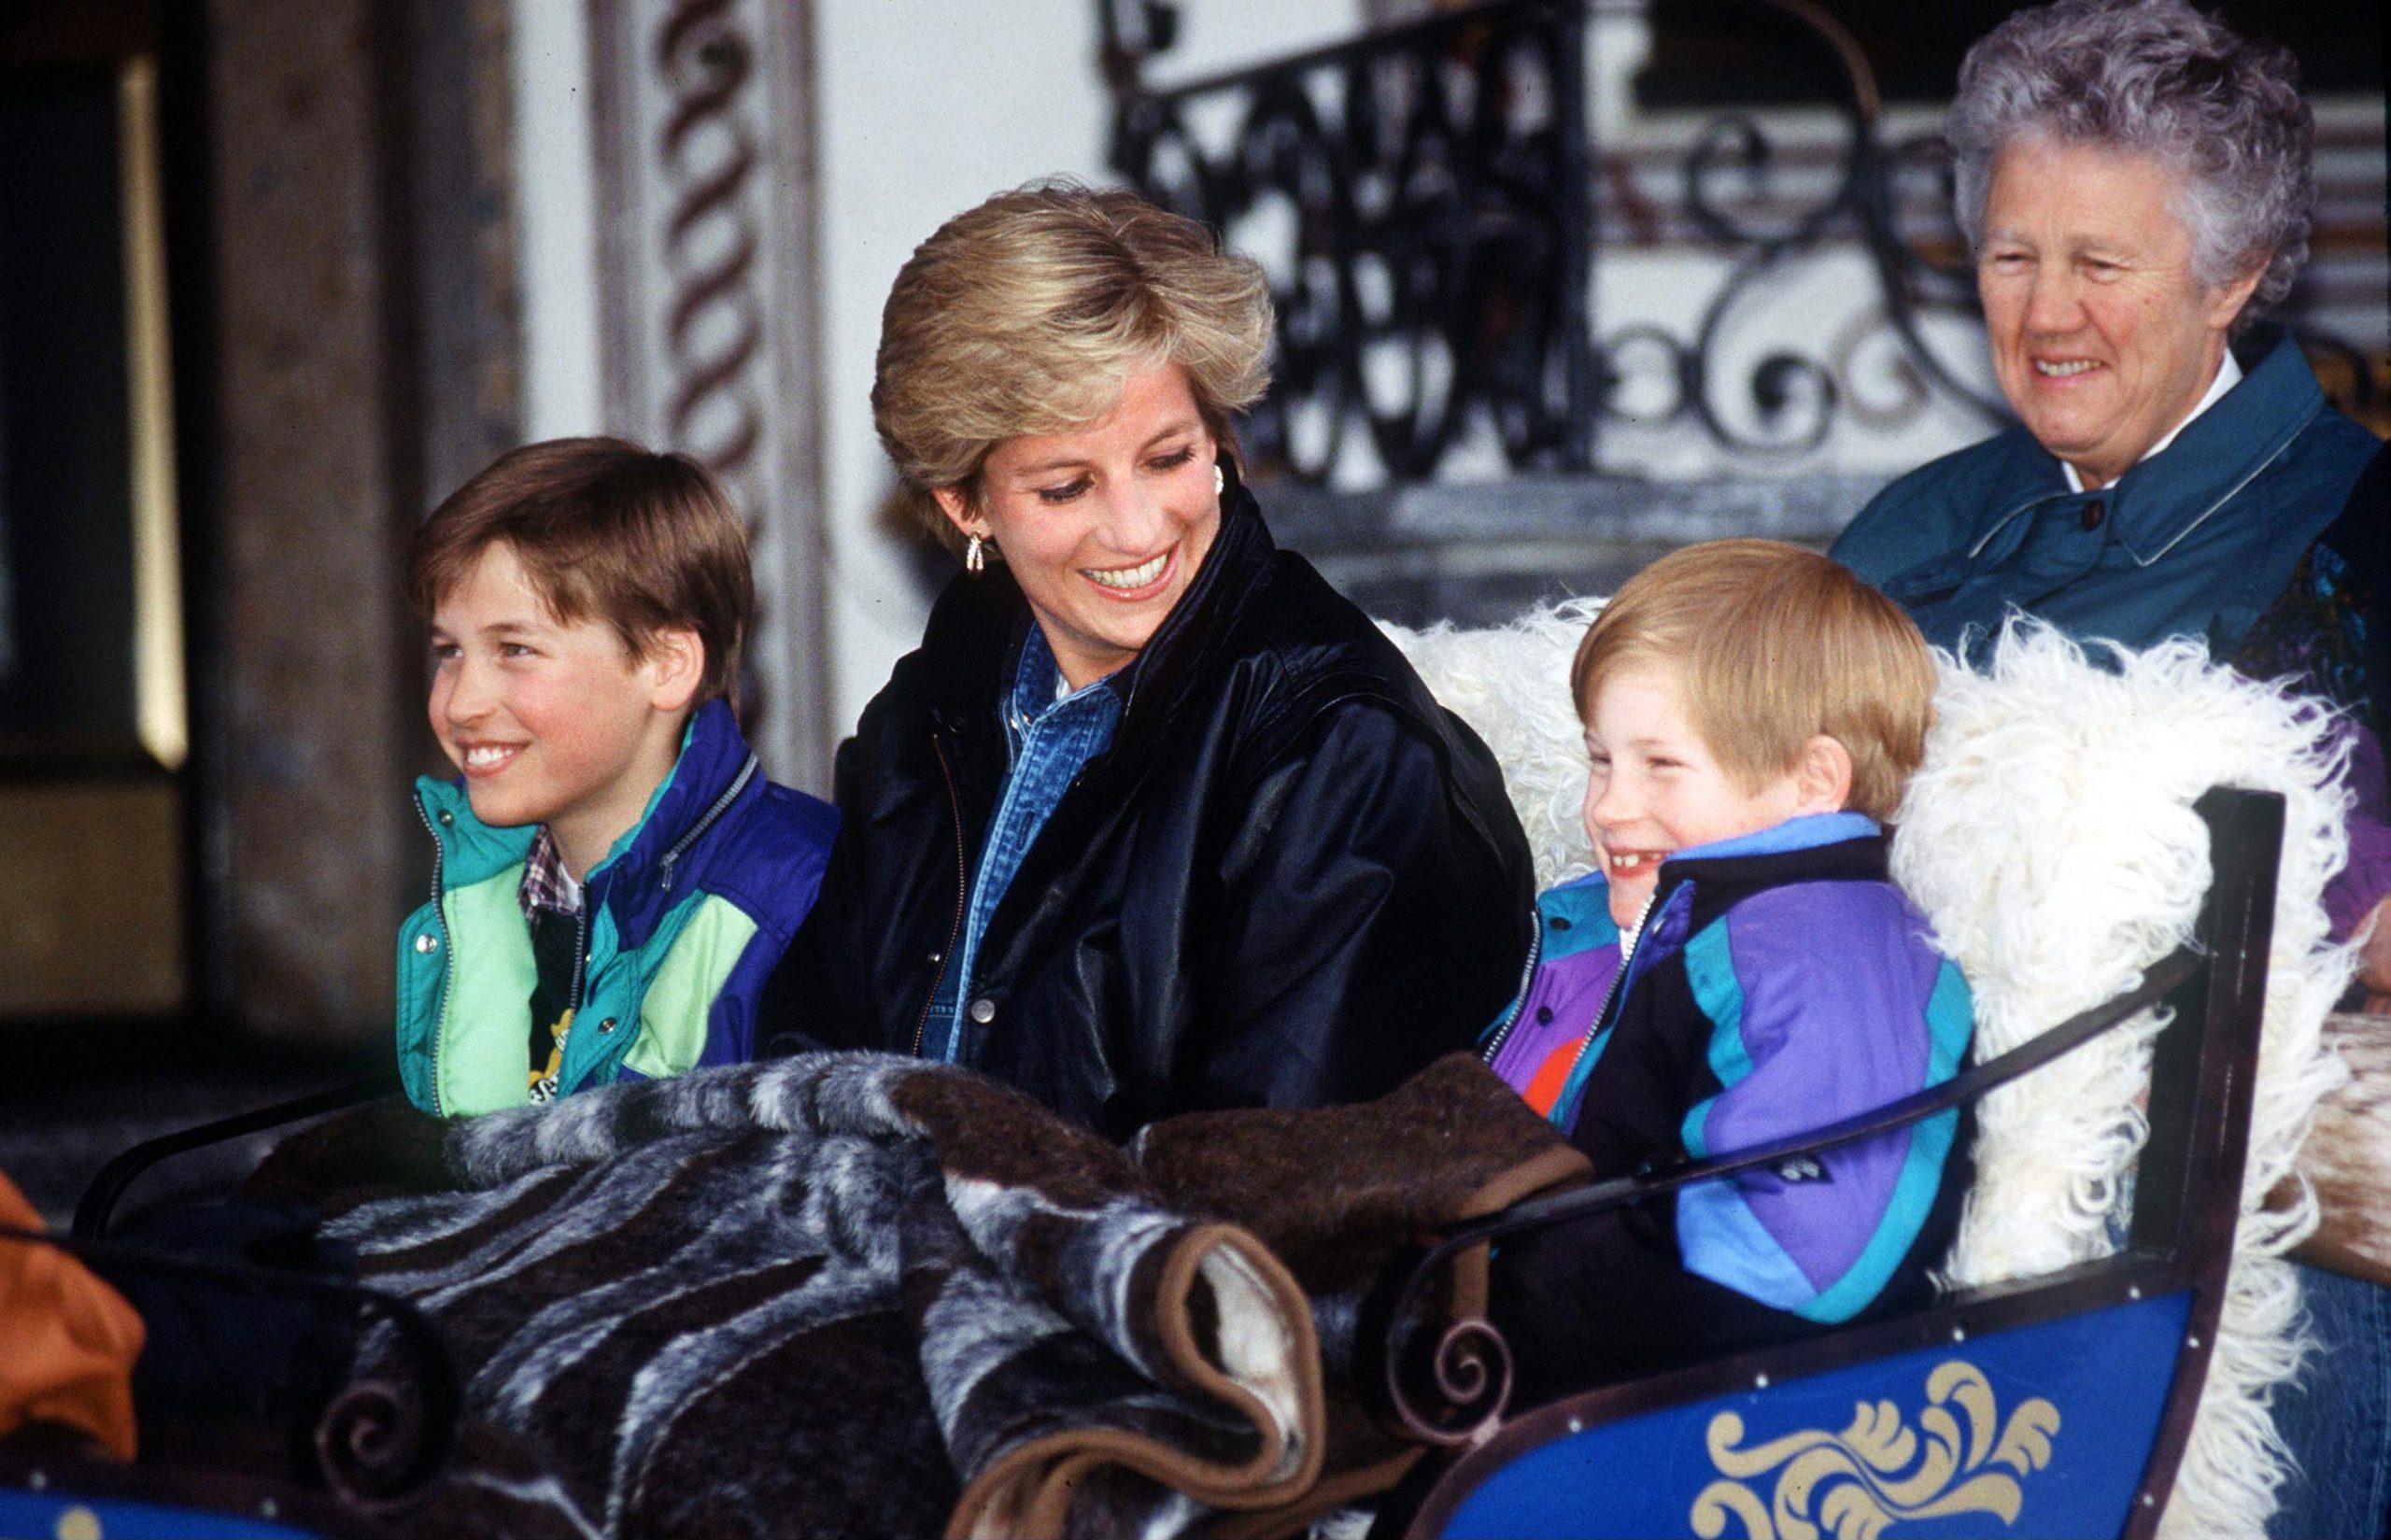 La Princesse Diana, le Prince Harry et le Prince William